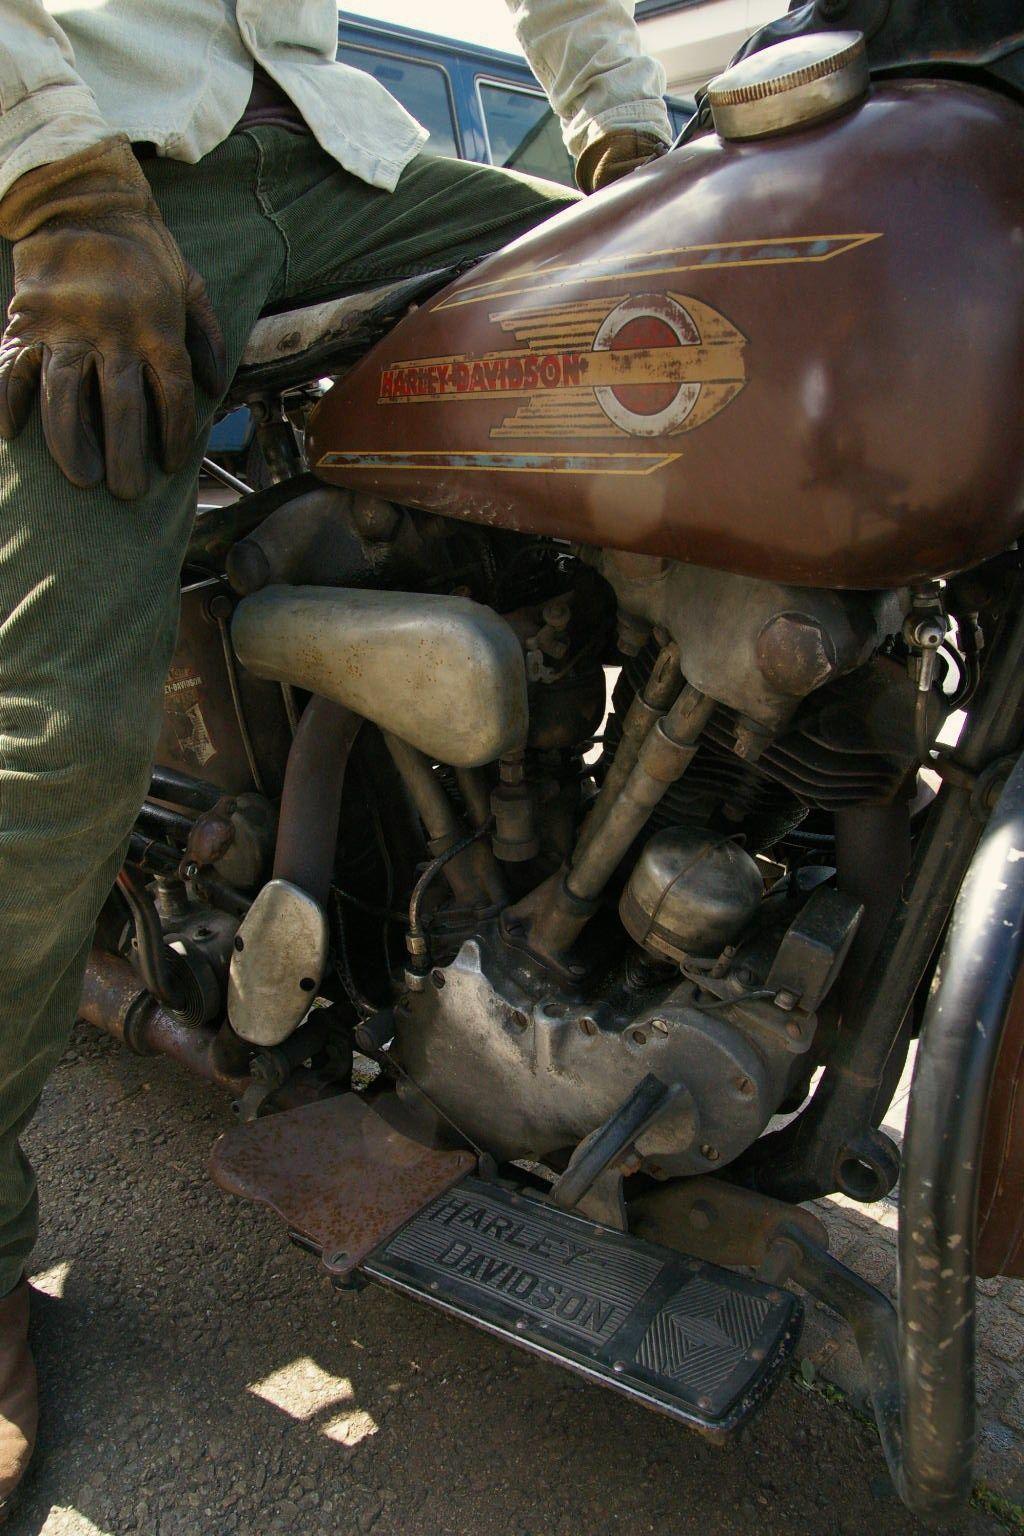 Custom Culture, chopper, bobber, custom motorcycles | www ...